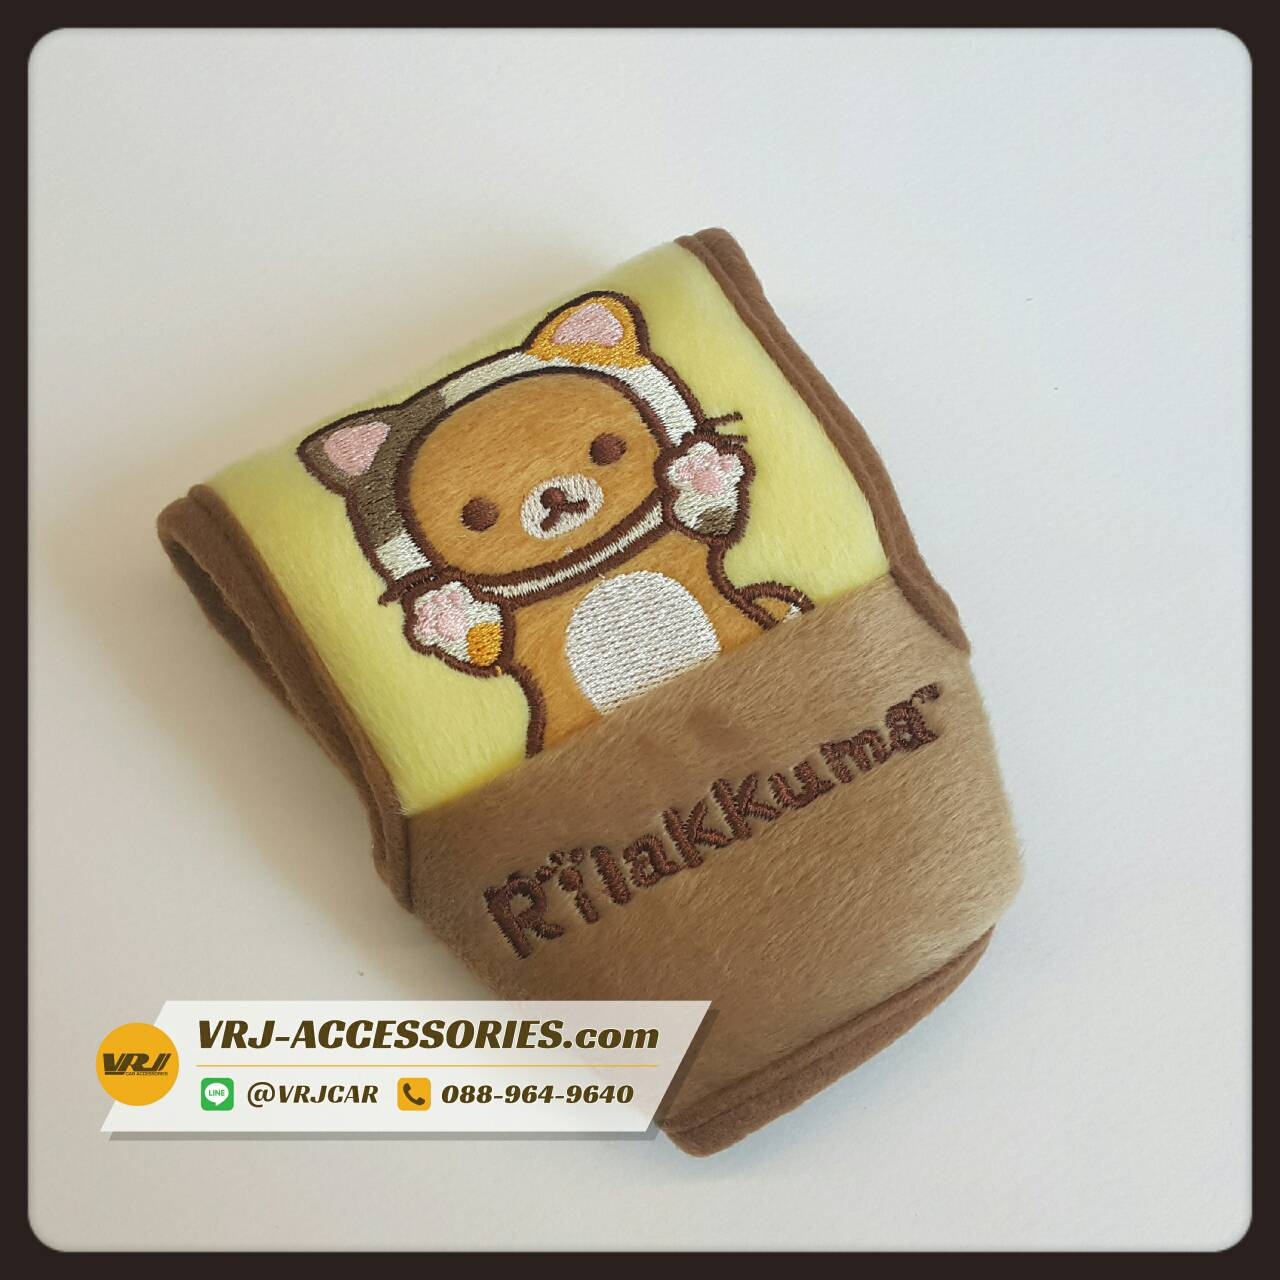 Rilakkuma หุ้มเกียร์ ออโต้ ริลัคคุมะ หมีแมว Knob cover